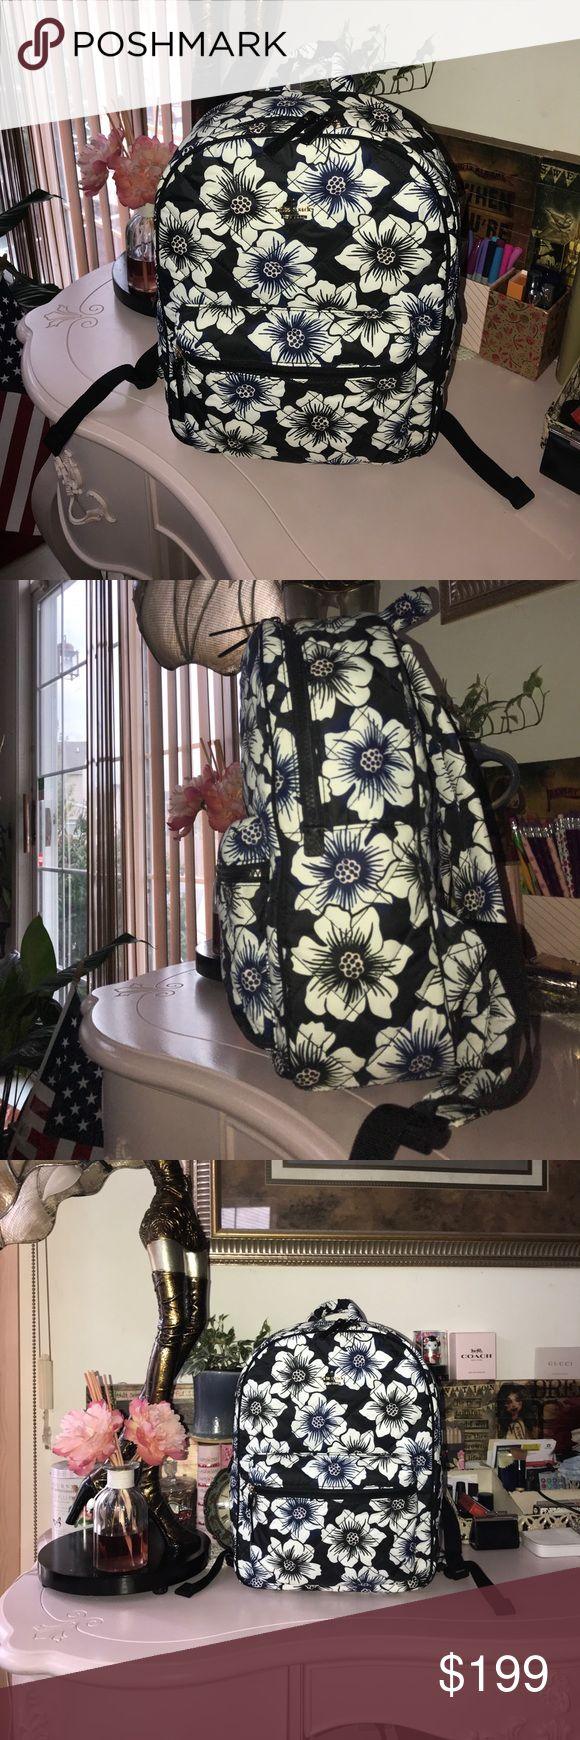 Kate Spade Black Floral Siggy Backpack $225 Kate Spade Siggy Black Floral Multi Colored Backpack -New $225 kate spade Bags Backpacks